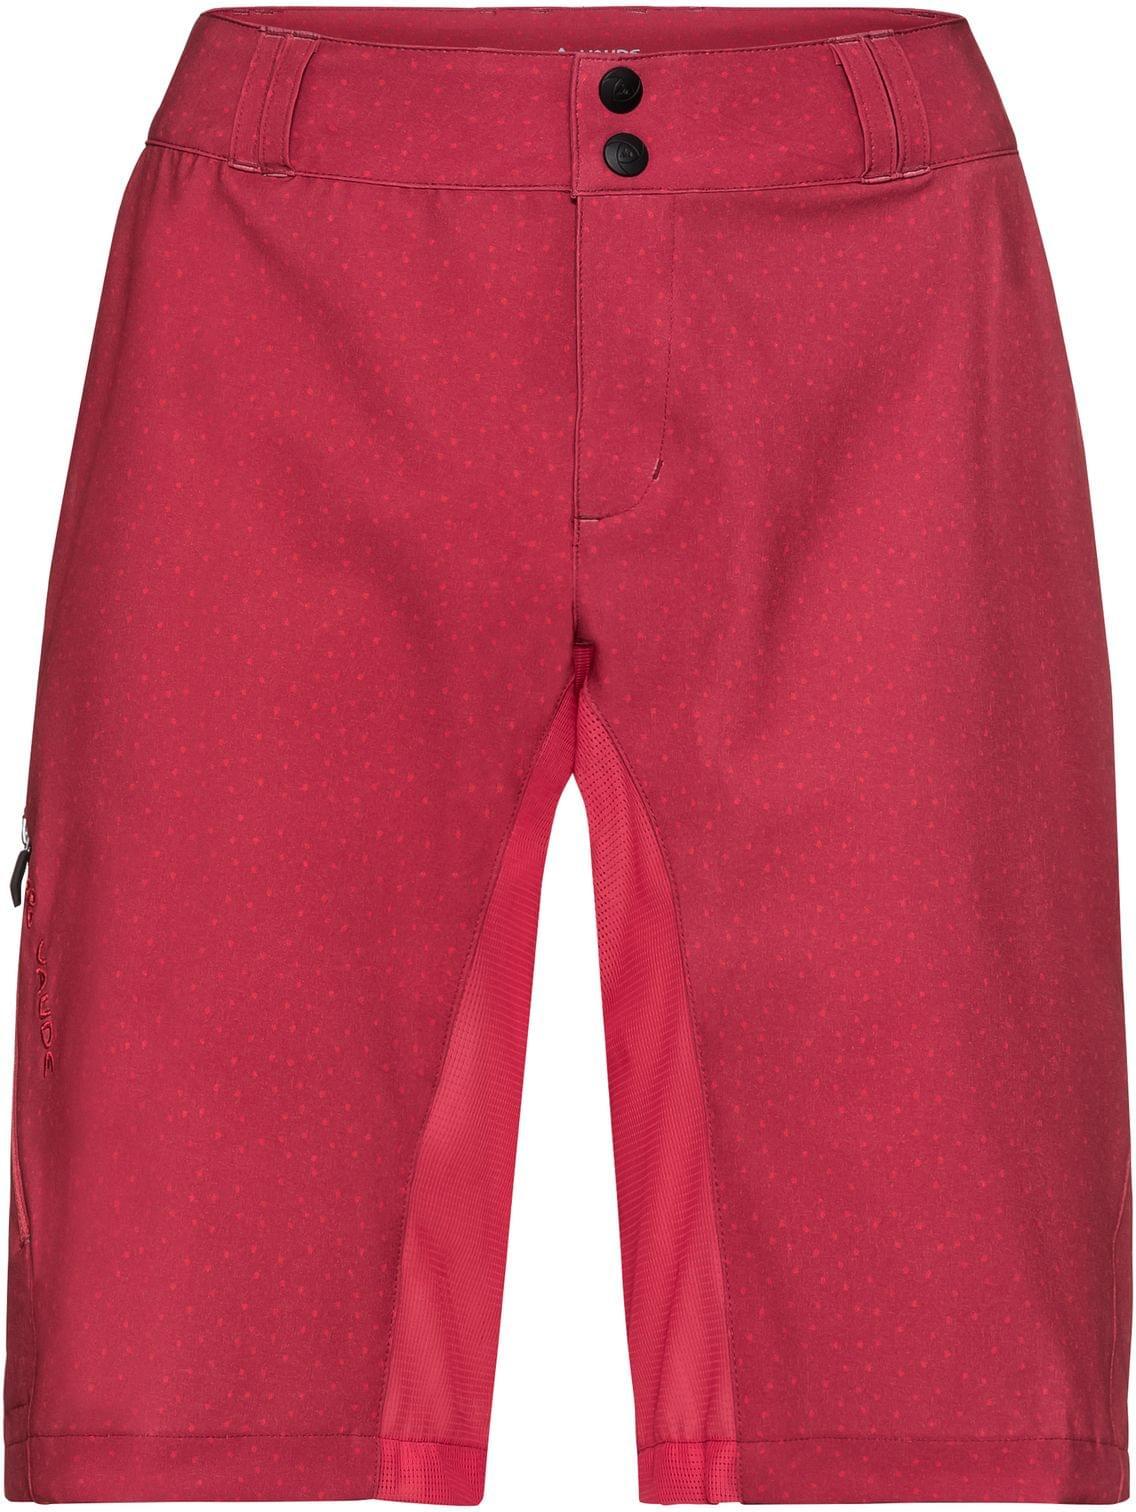 Vaude Women's Ligure Shorts - red cluster 40